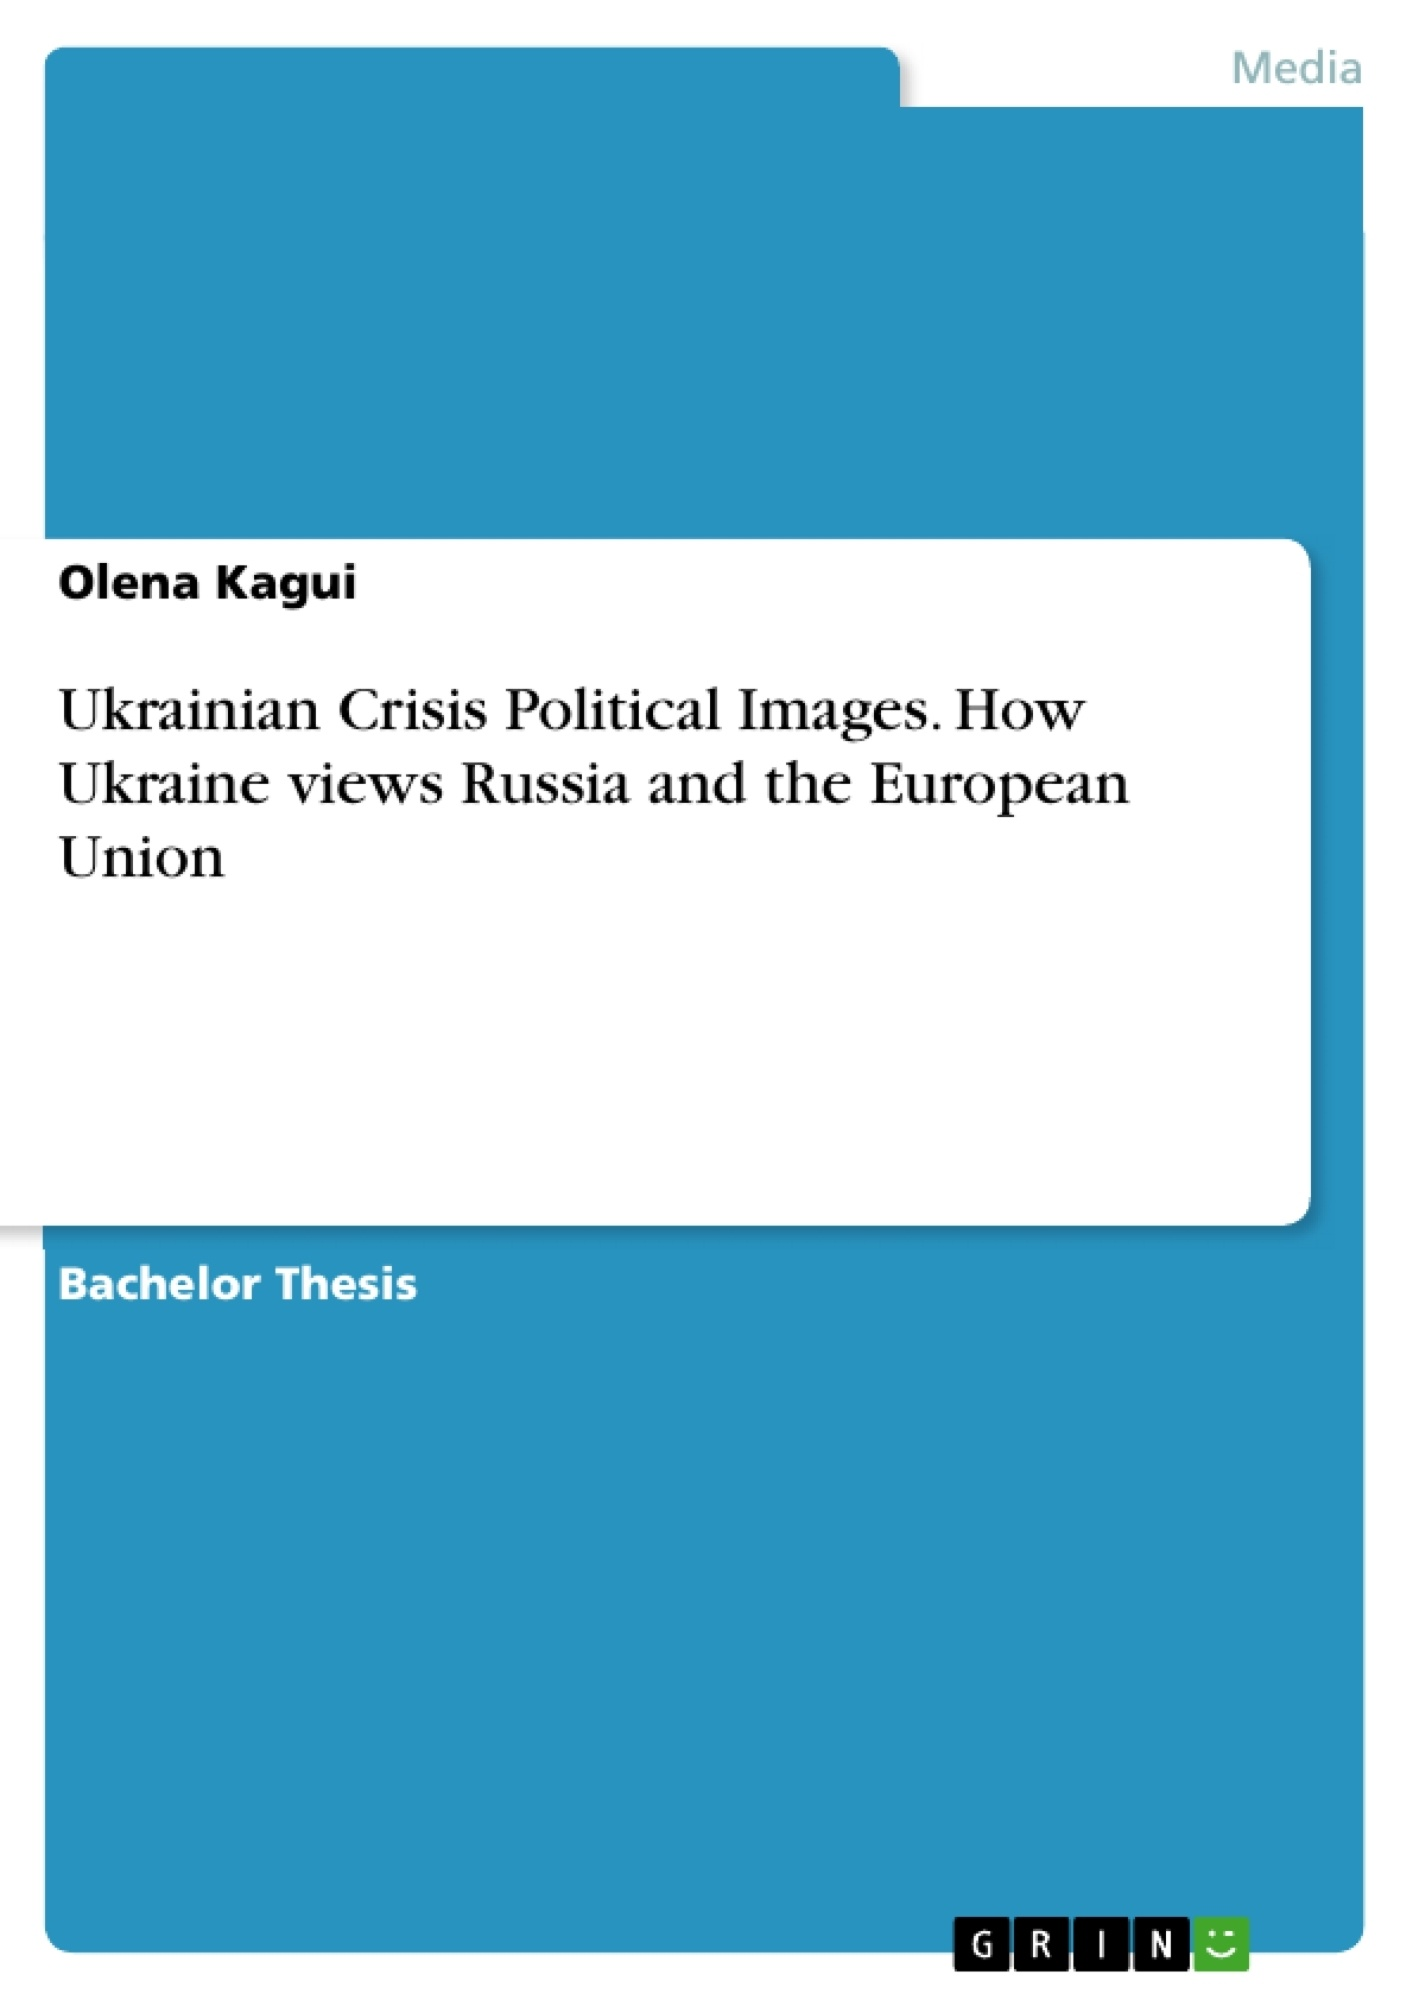 Title: Ukrainian Crisis Political Images. How Ukraine views Russia and the European Union